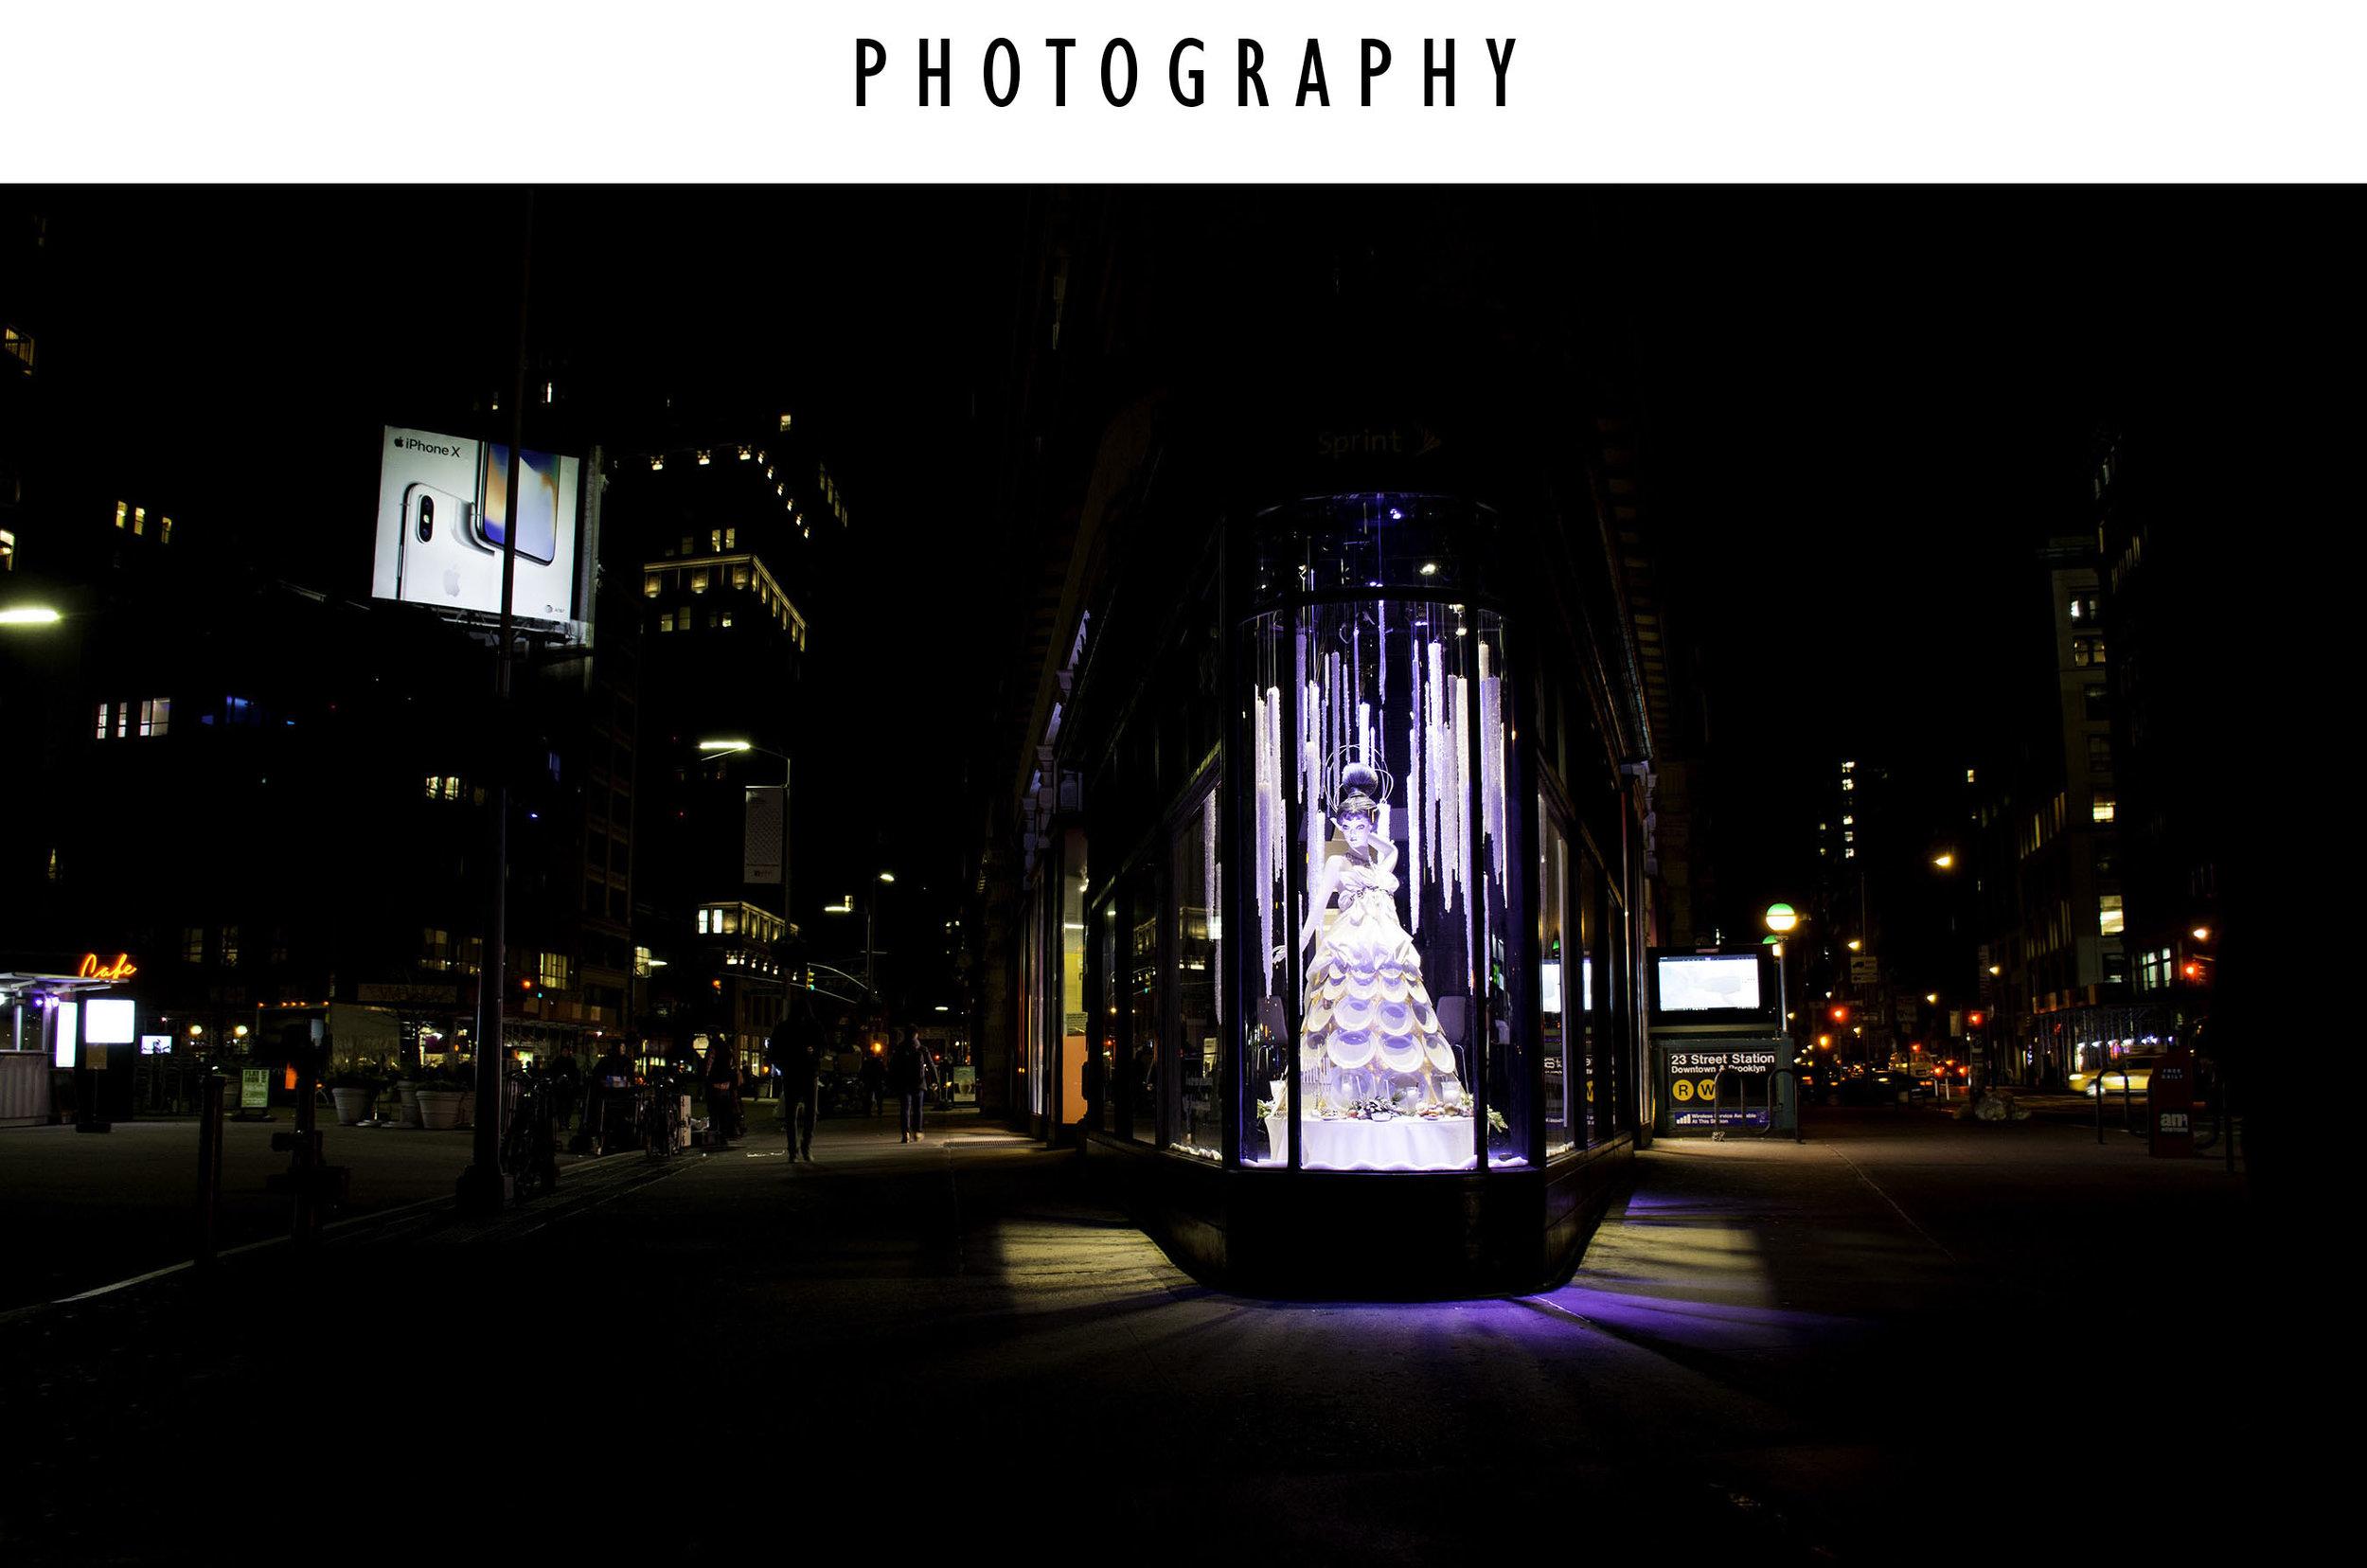 photogrpahy_image.jpg